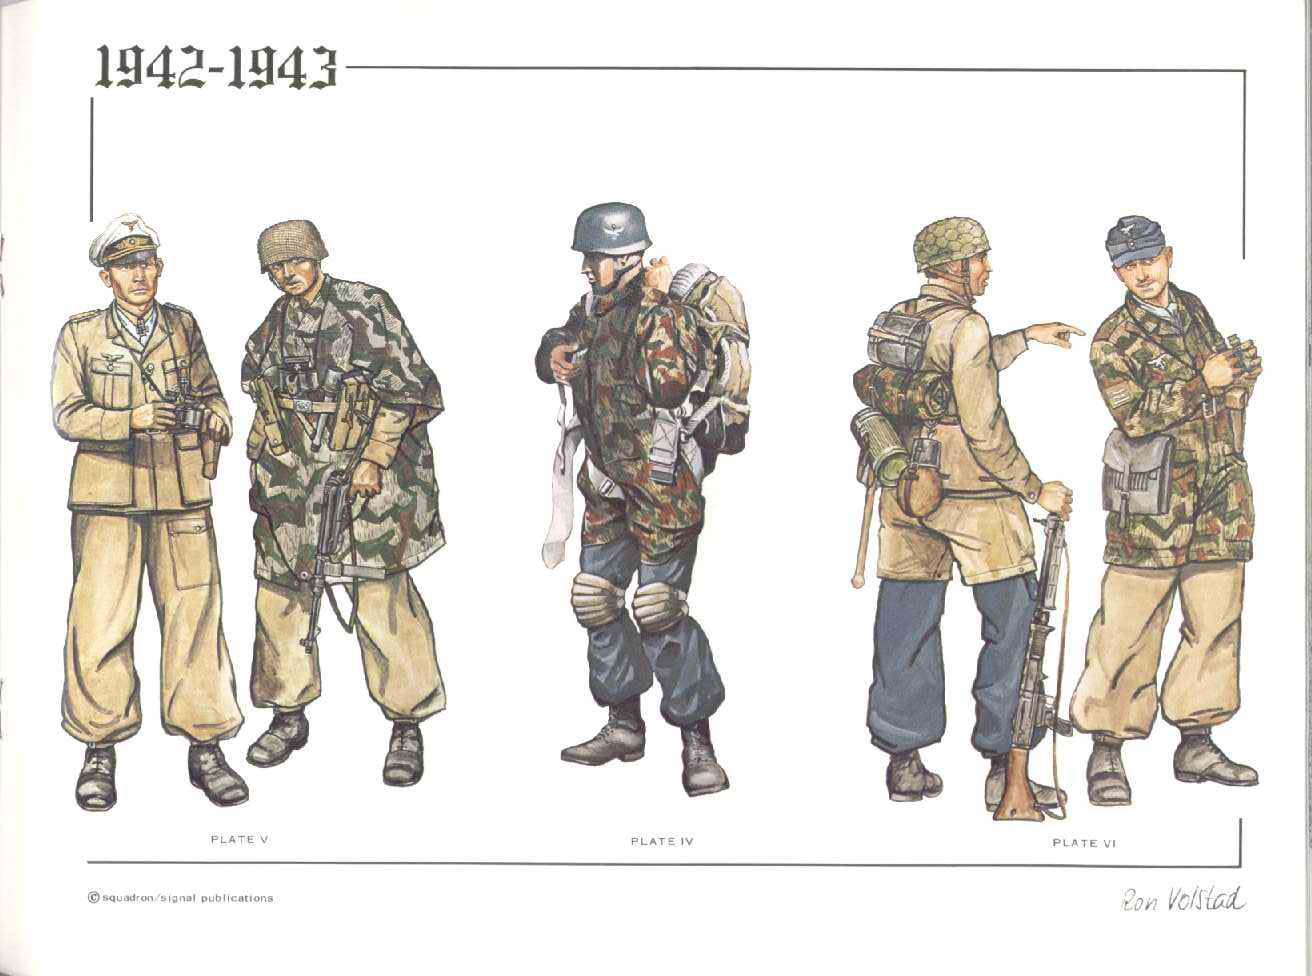 Squadron Signal 3001 Combat Troops Fallschmirjagers_Страница_27.jpg